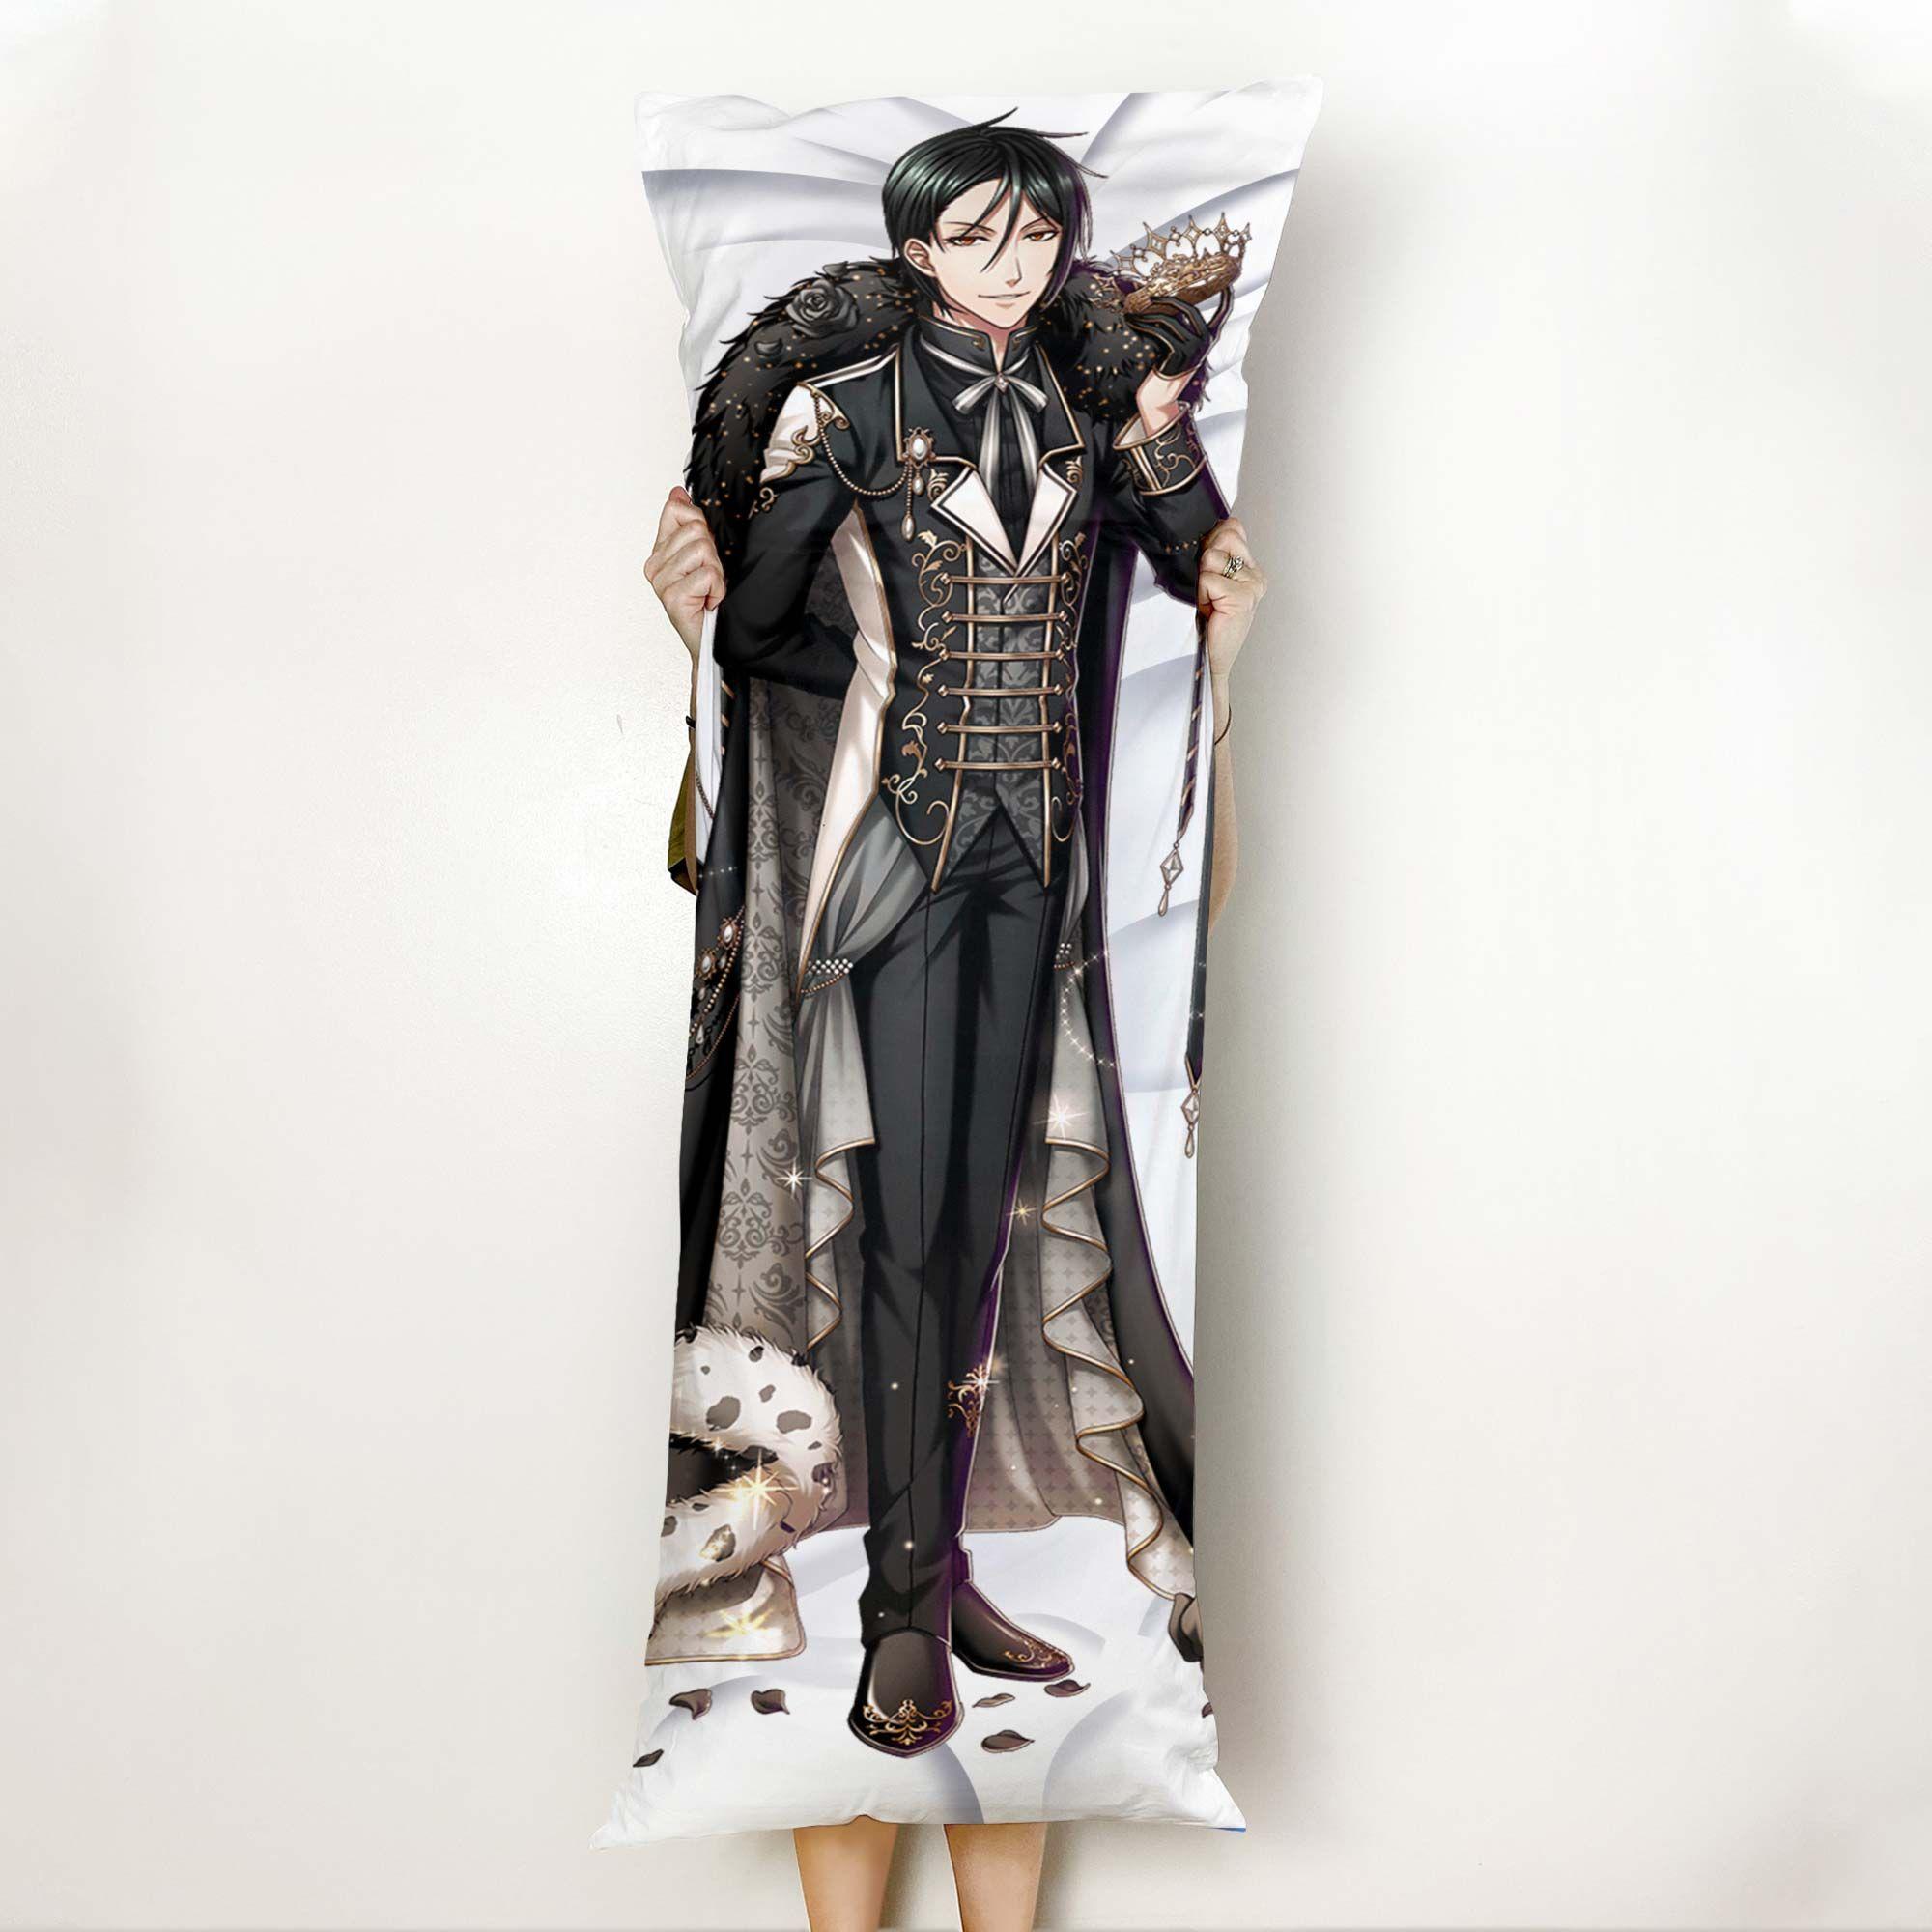 Sebastian Michaelis Body Pillow Cover Custom Black Butler Anime Gifts Official Merch GO0110